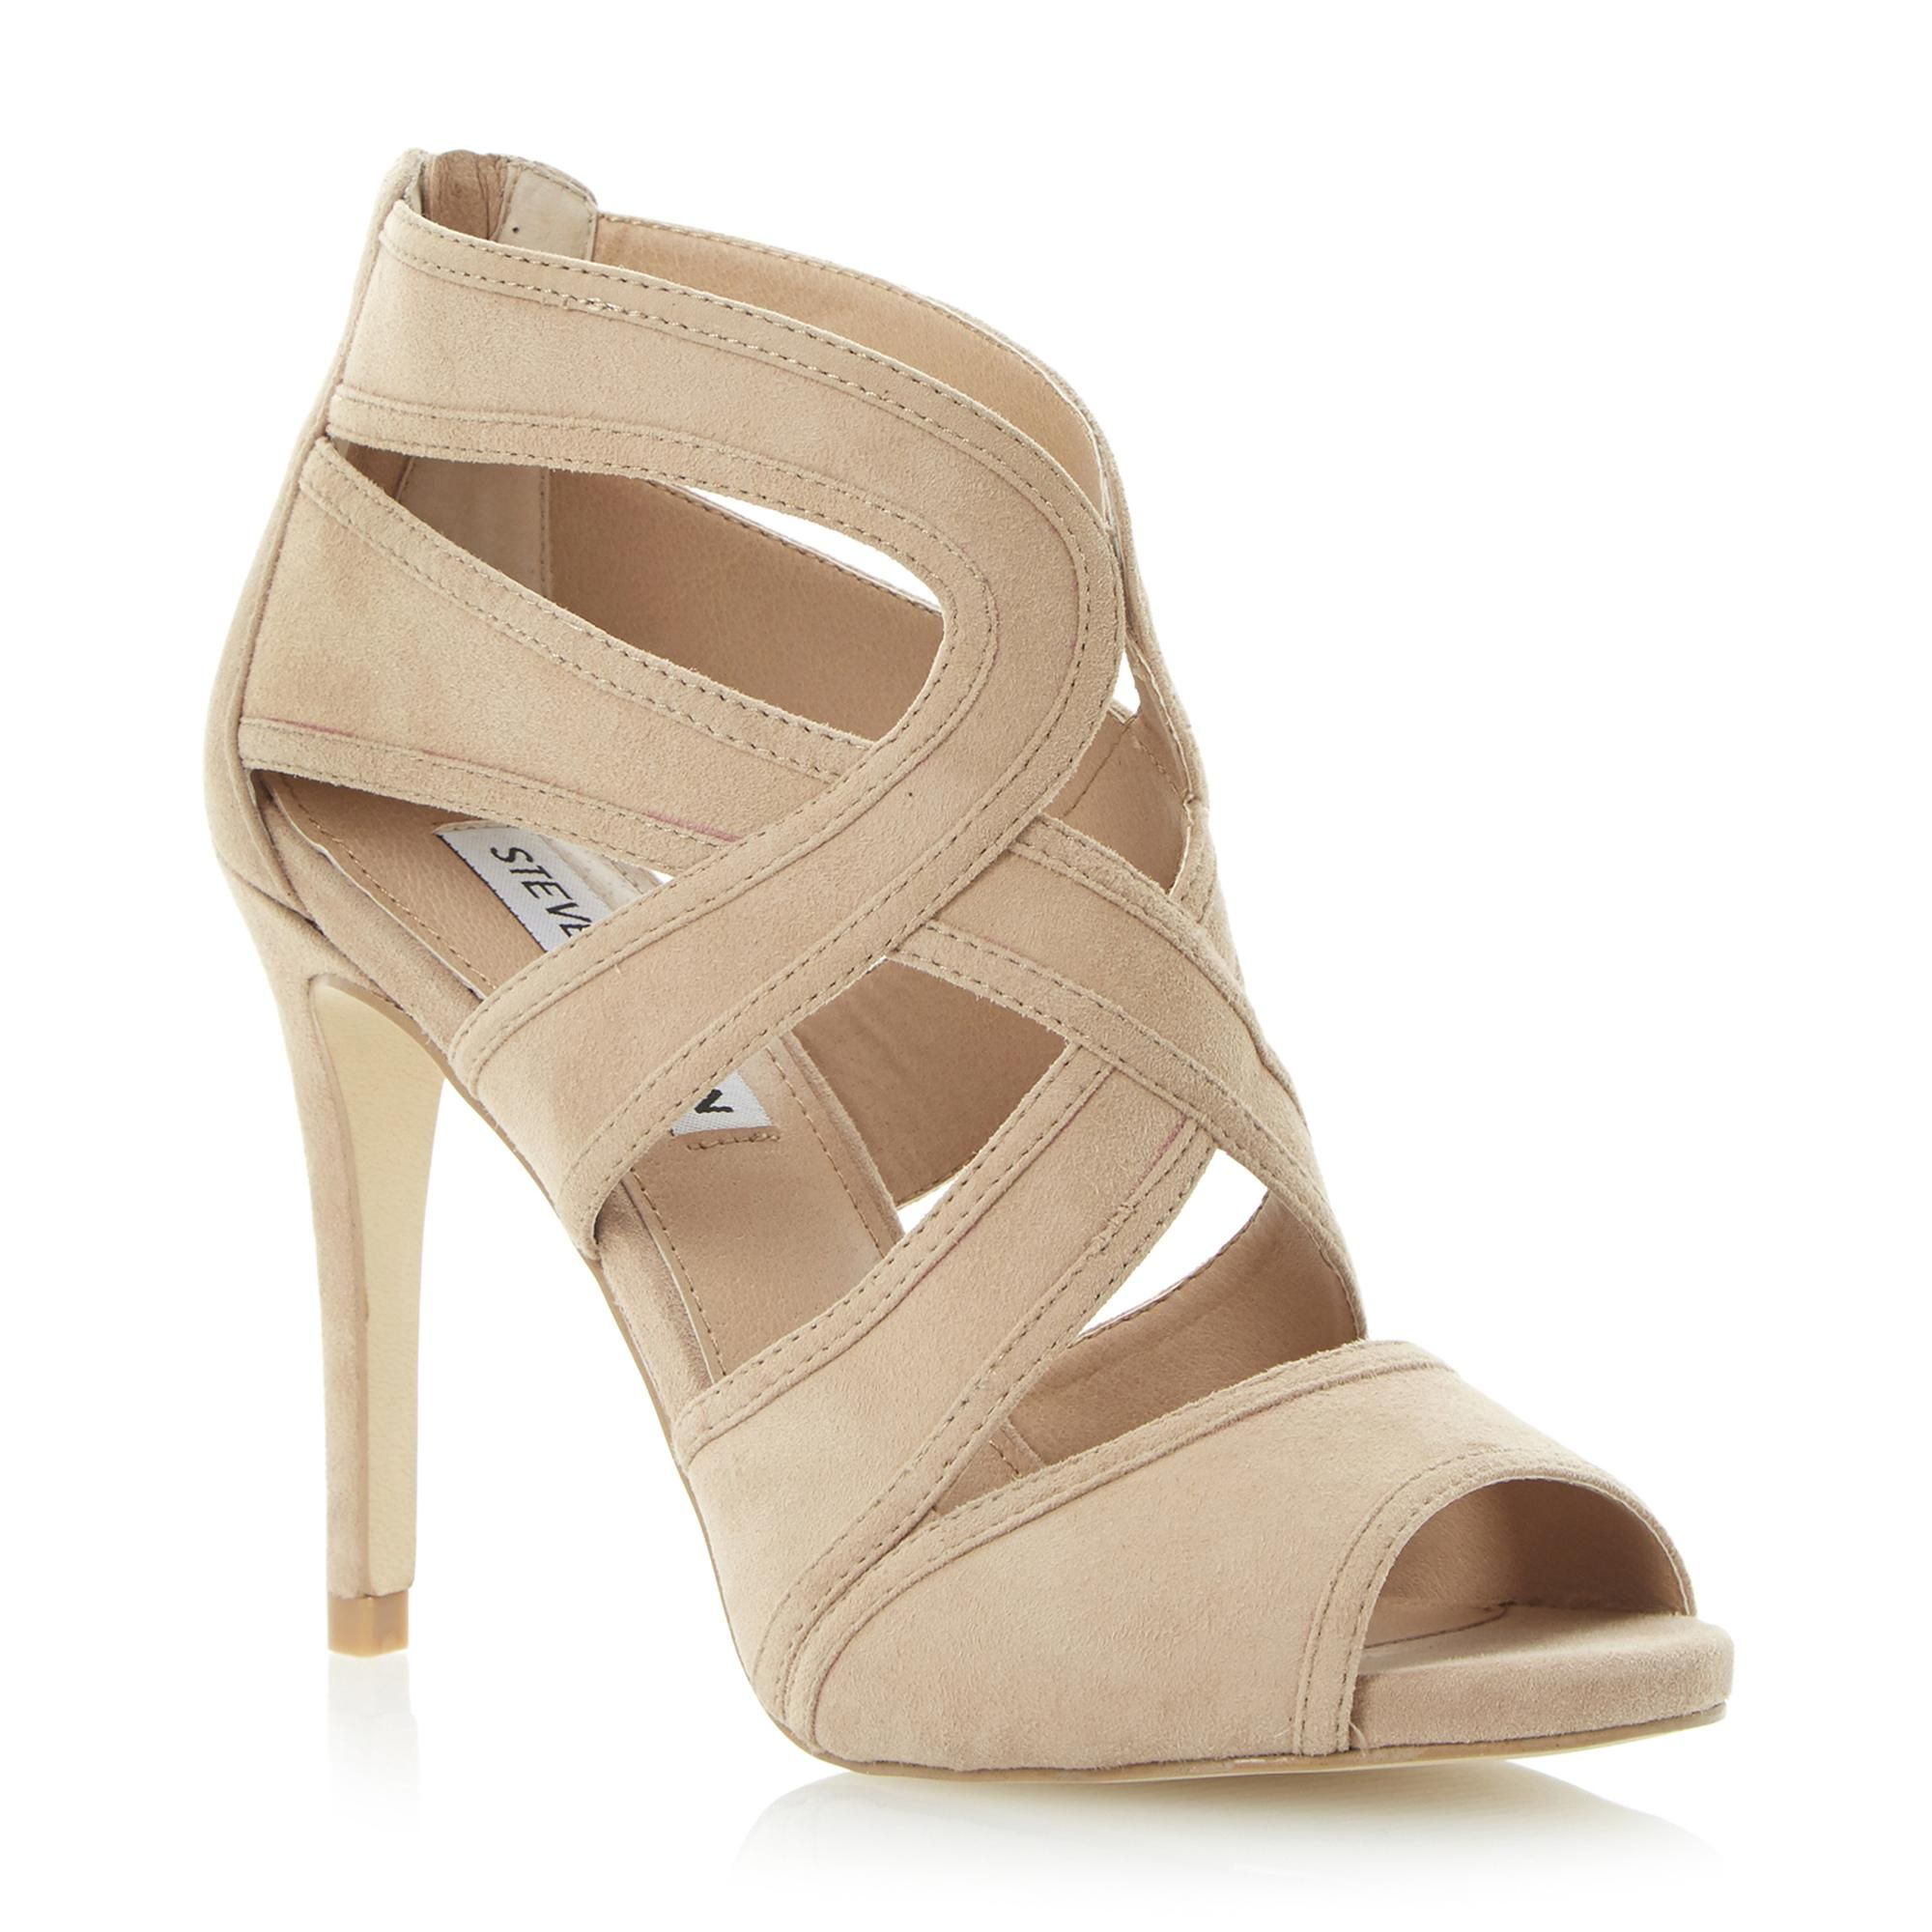 High quality Sandals Steve Madden Immence Women Silver Glitter US Online